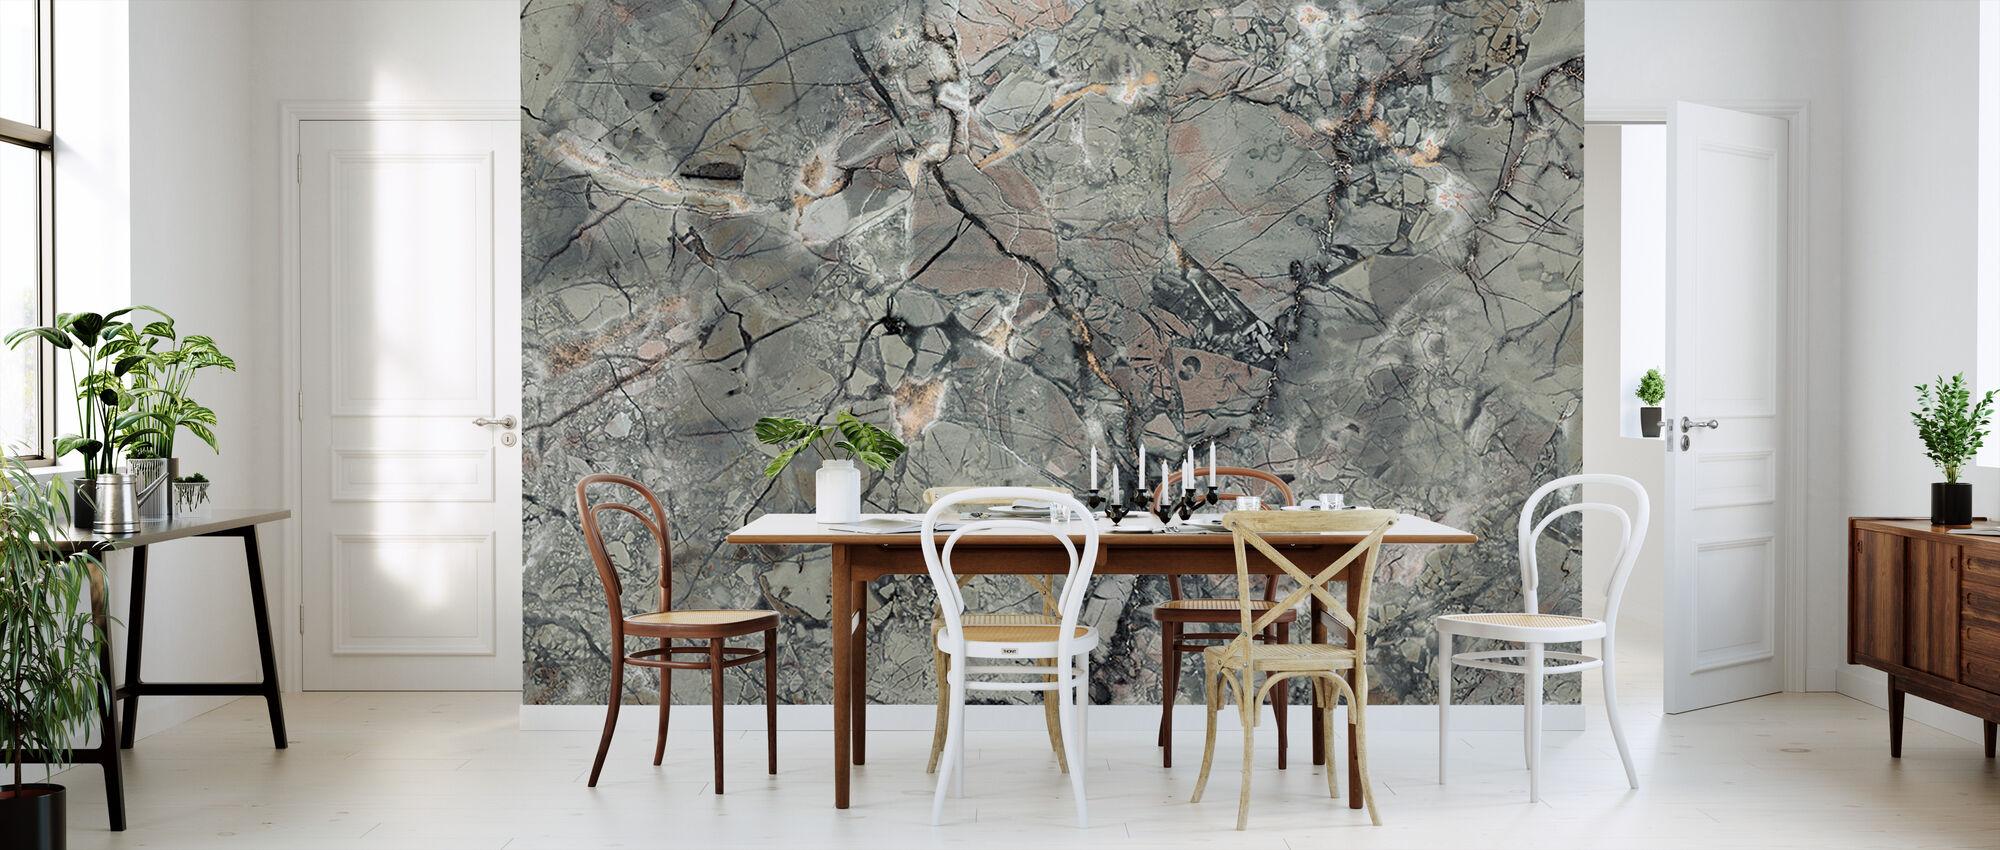 Marble Texture - Wallpaper - Kitchen